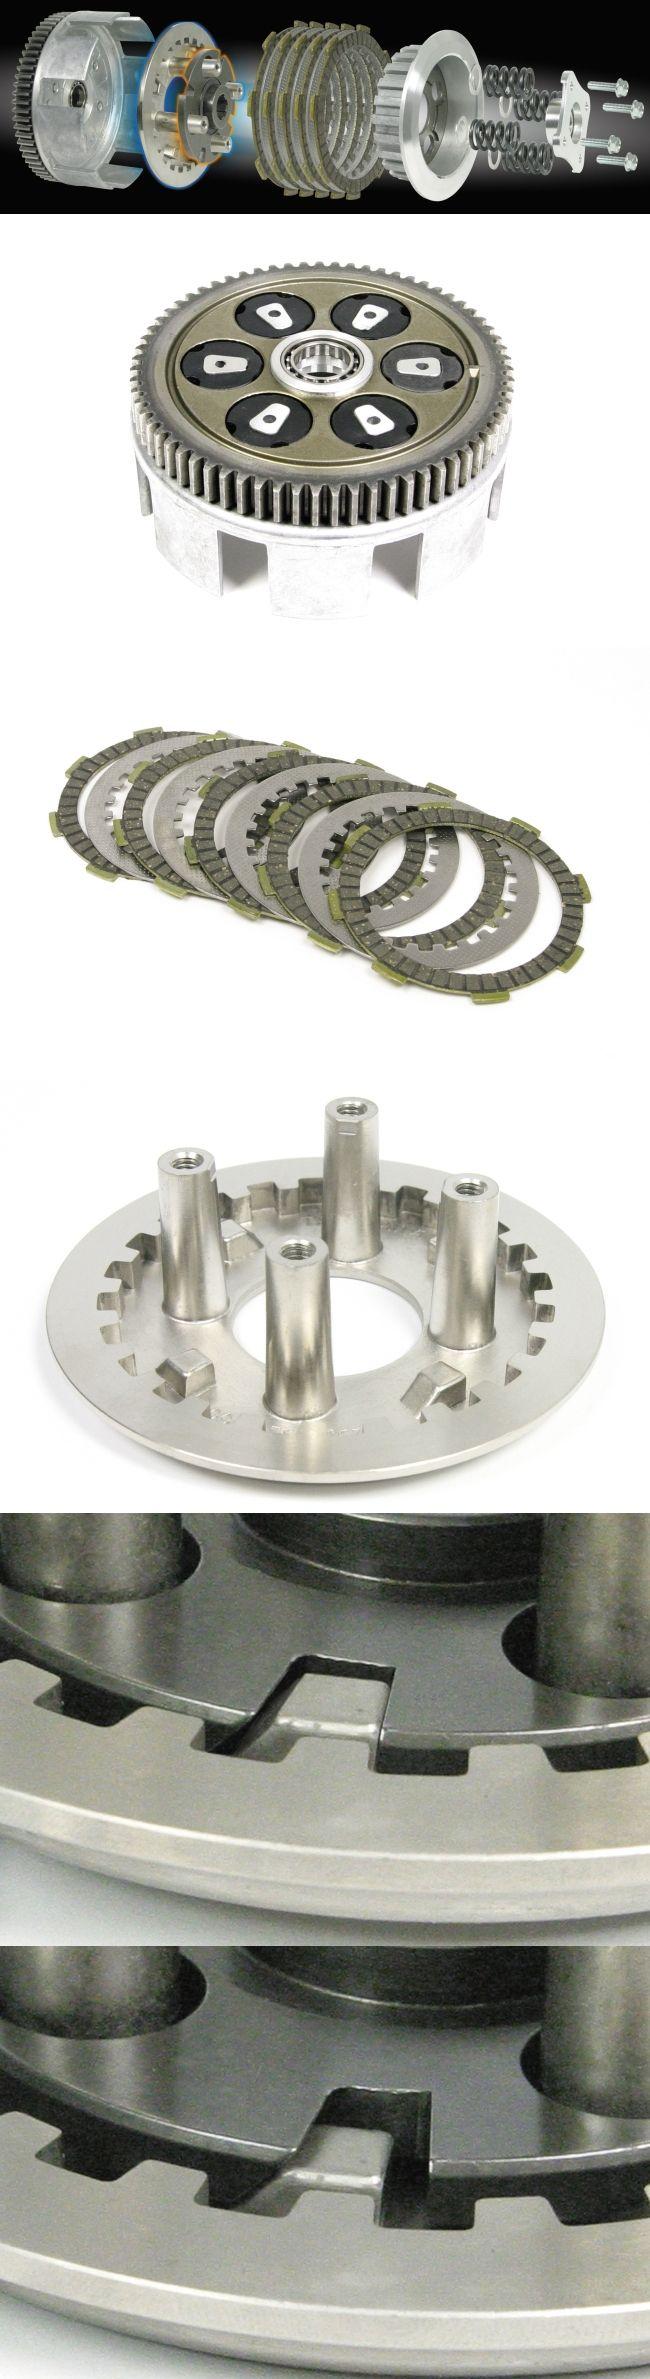 【SP武川】滑動式離合器標準套件 - 「Webike-摩托百貨」